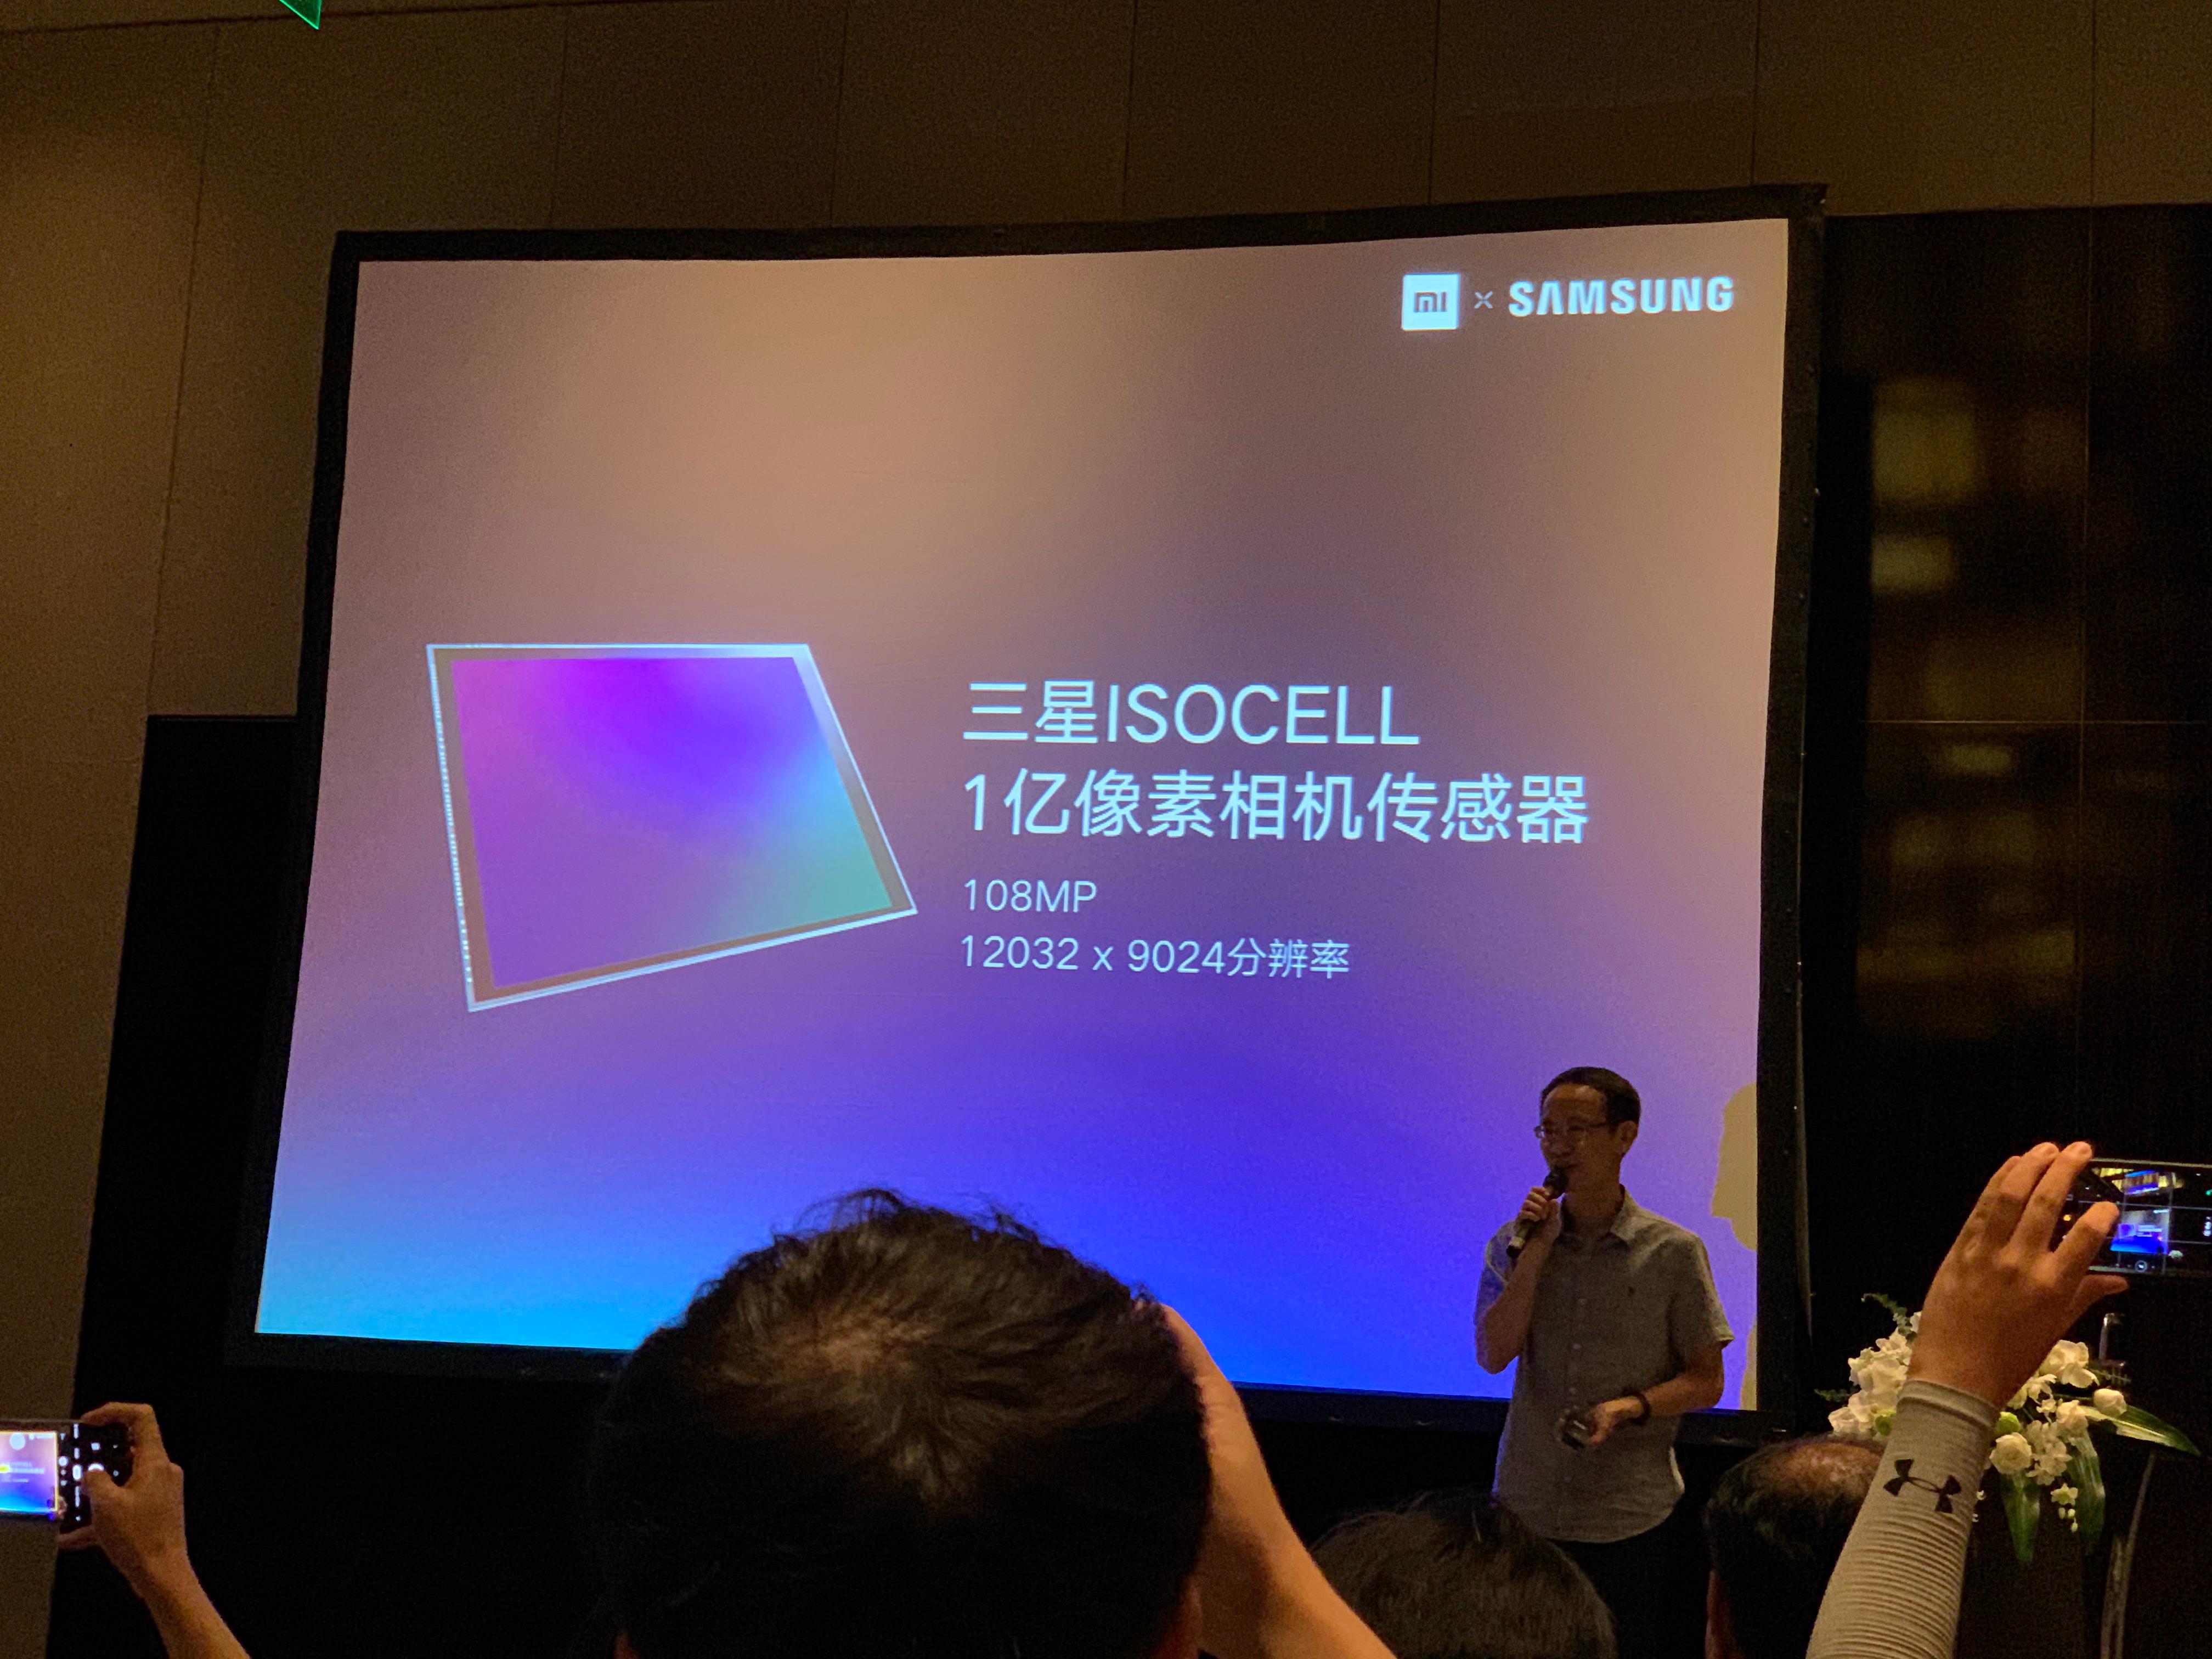 Xiaomi Mi Mix 4 Might Feature 108MP Camera